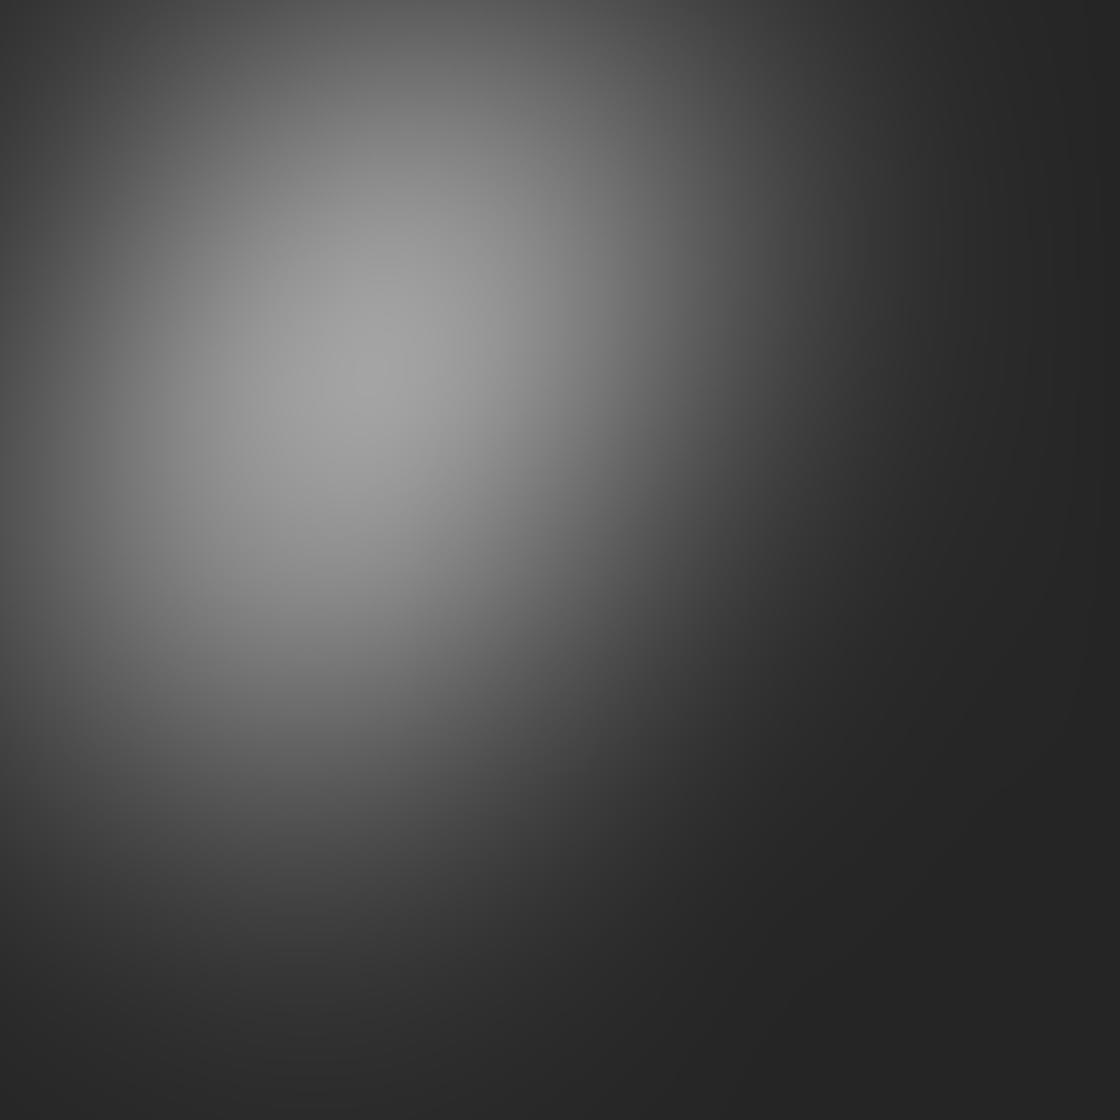 iPhone Photography Light 13